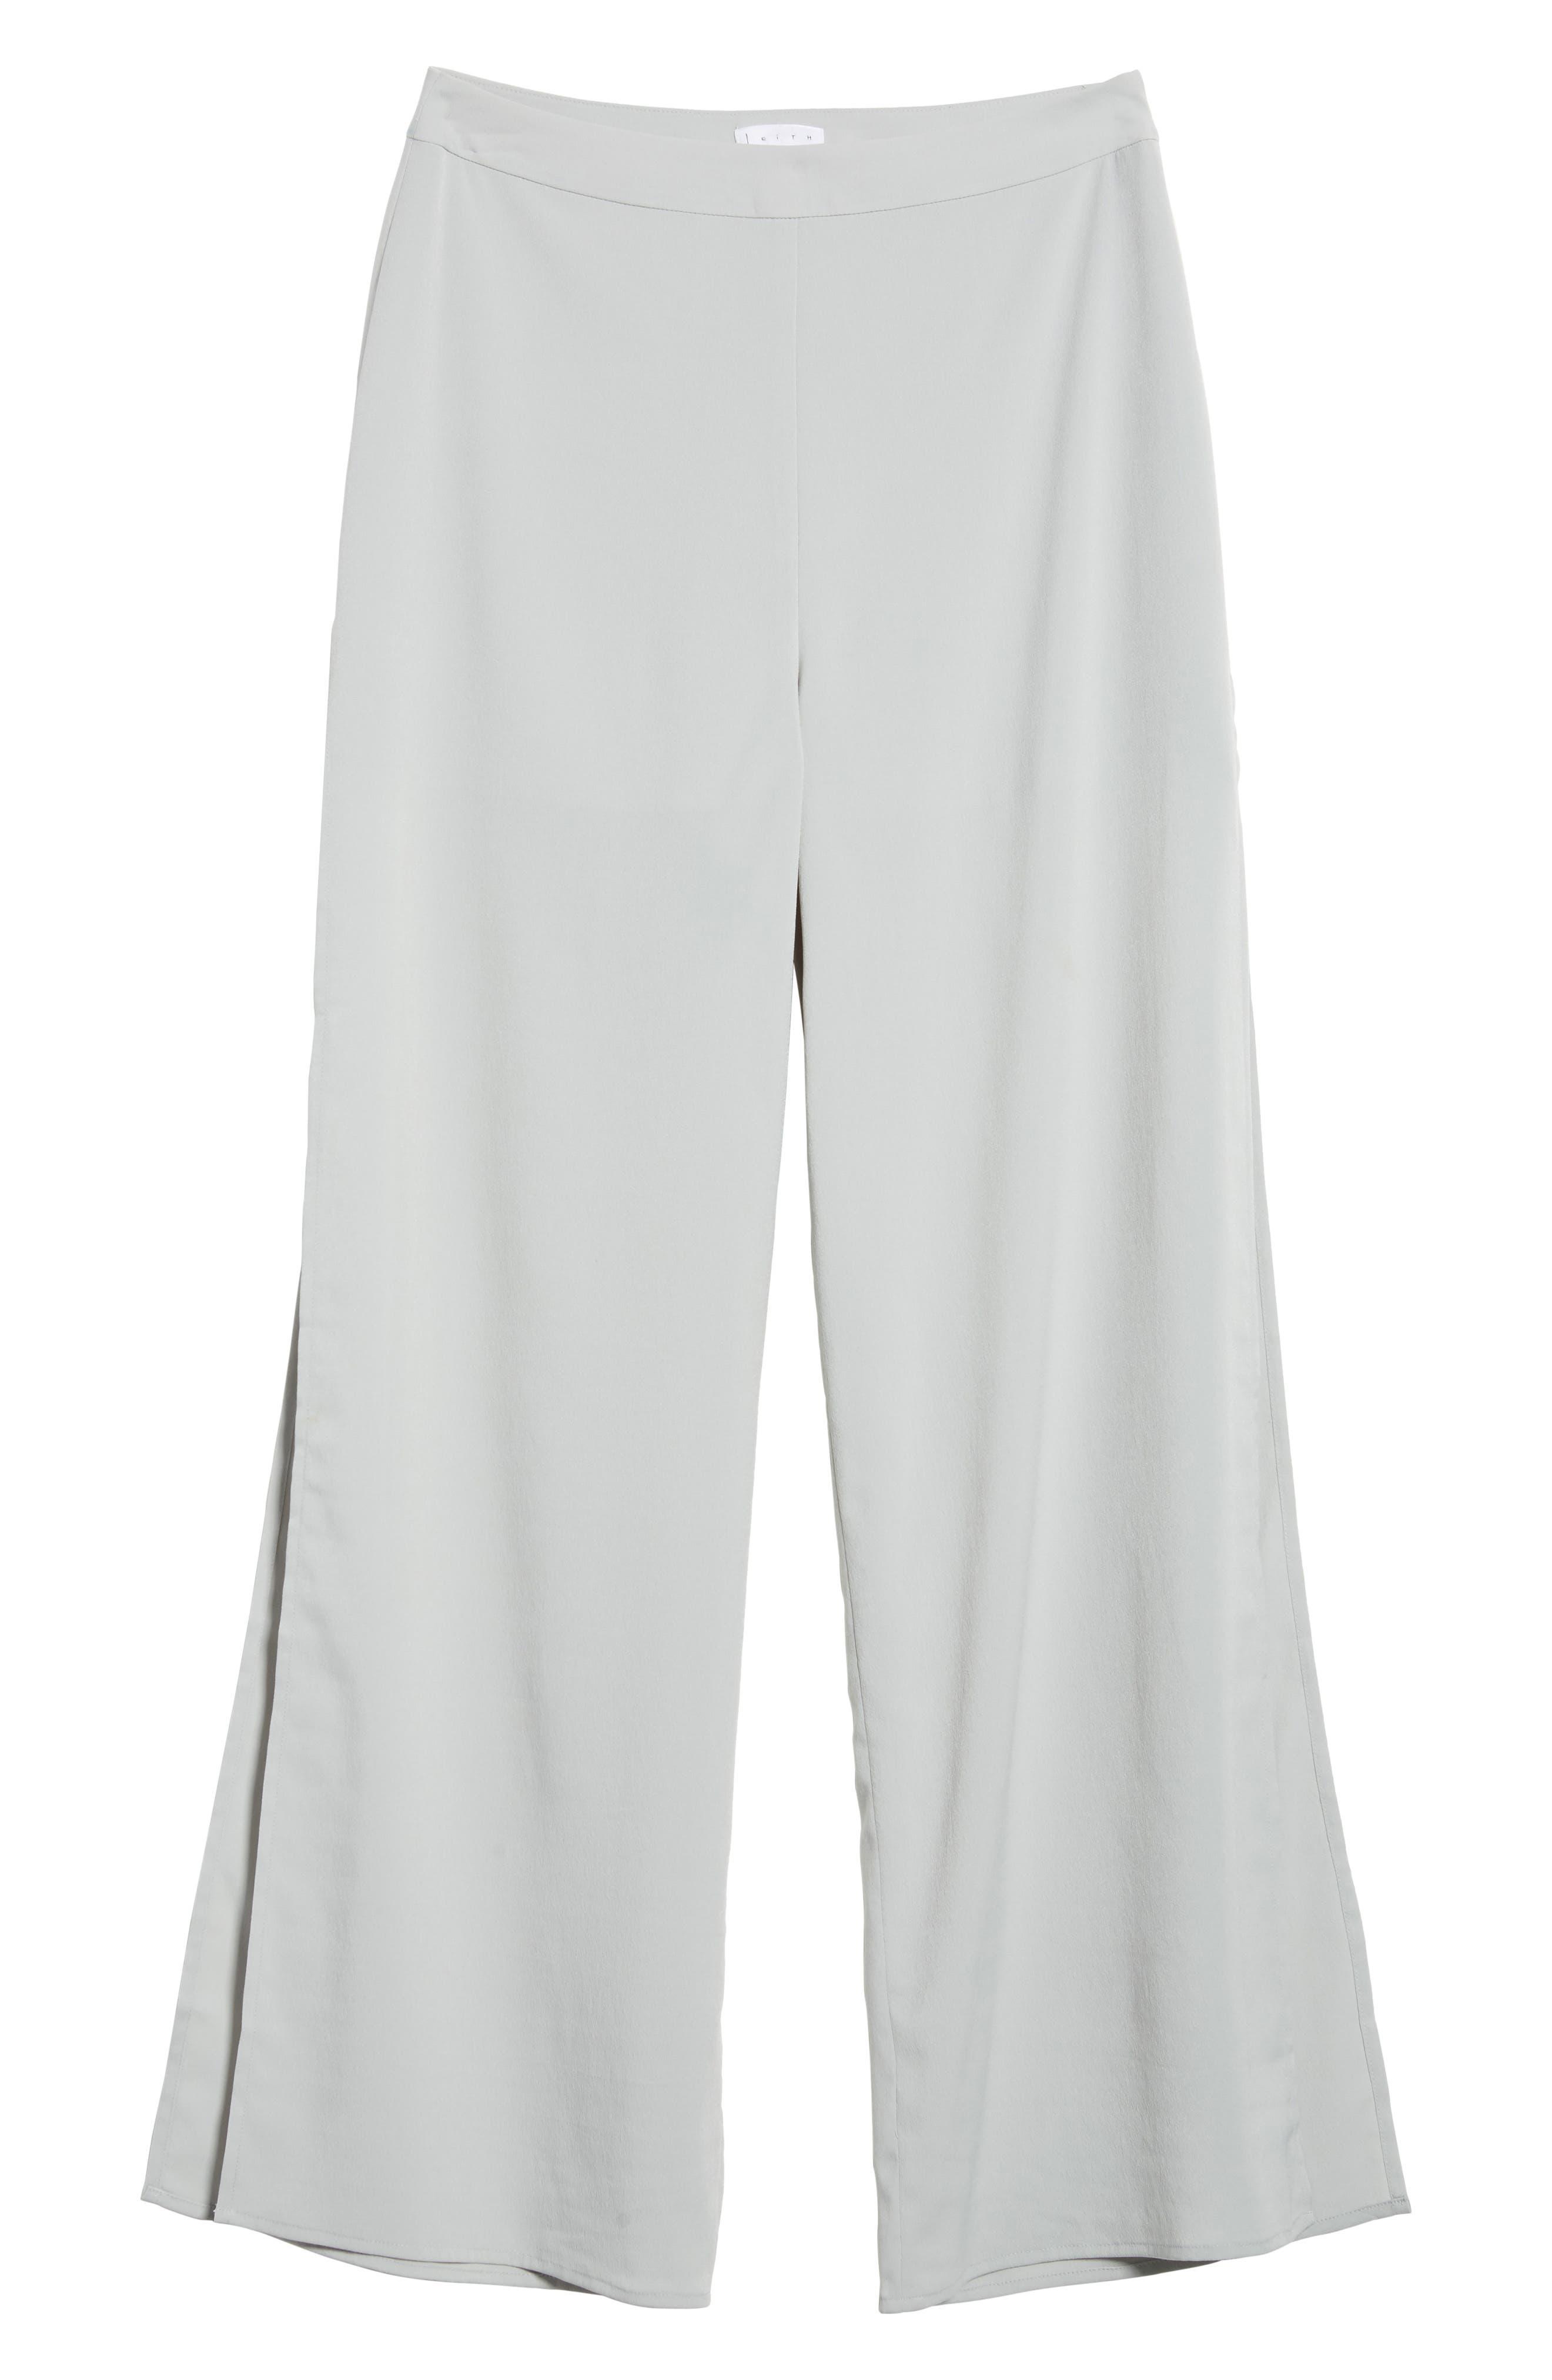 High Waist Side Slit Wide Leg Pants,                             Alternate thumbnail 7, color,                             450